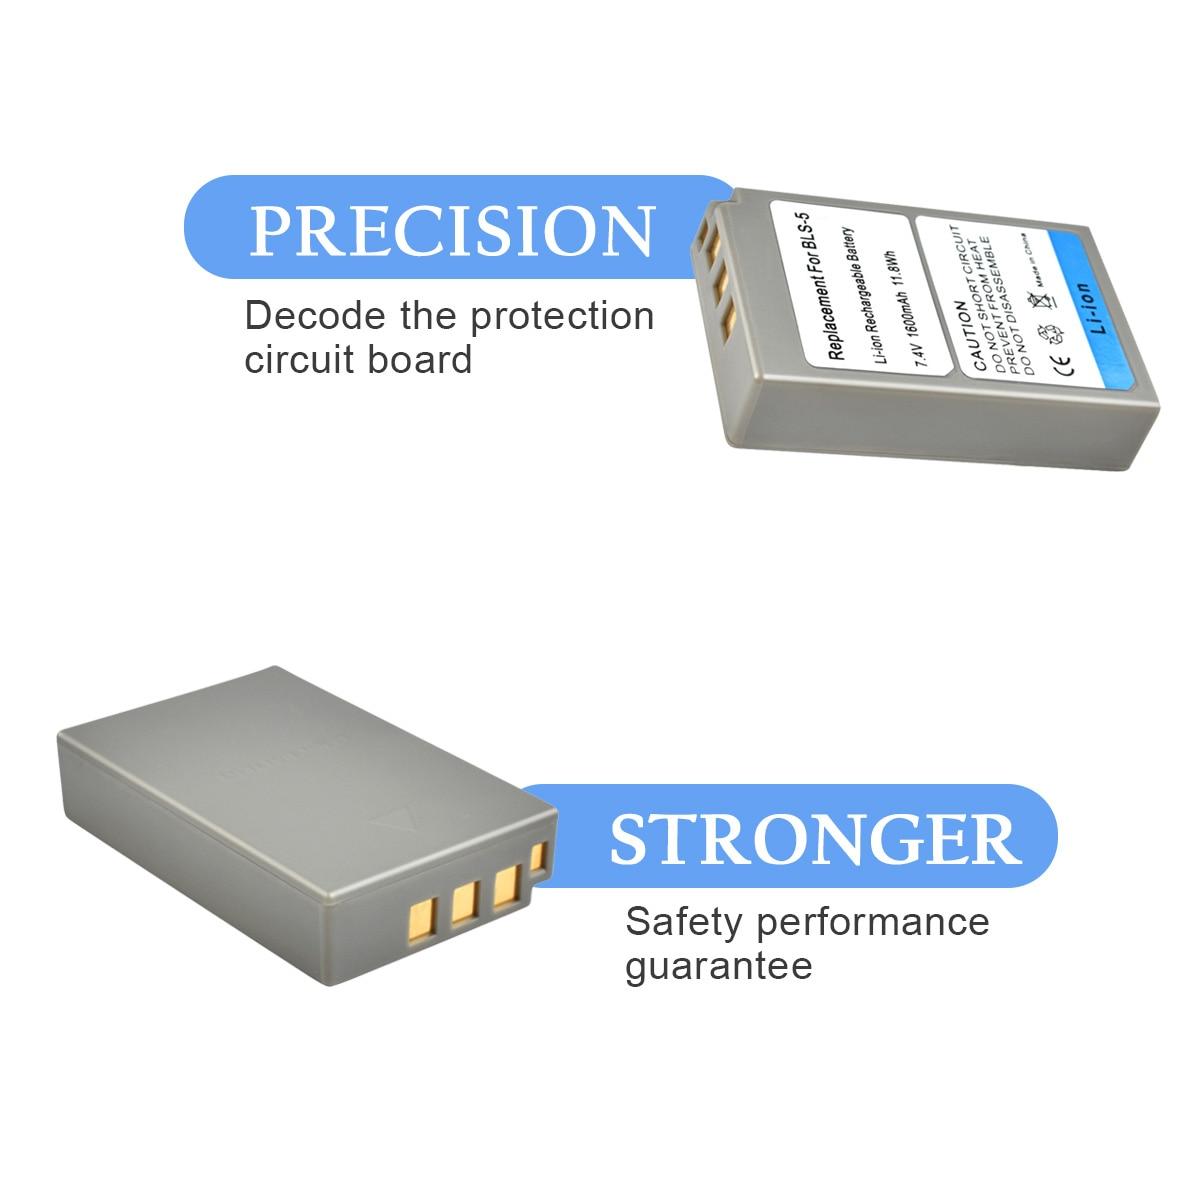 Stromquelle Streng Ohd Original 1600 Mah Bln-1 Ps-bln1 Bln 1 Digital Kamera Batterie Für Olympus E-m5 Em5 Omd Om-d